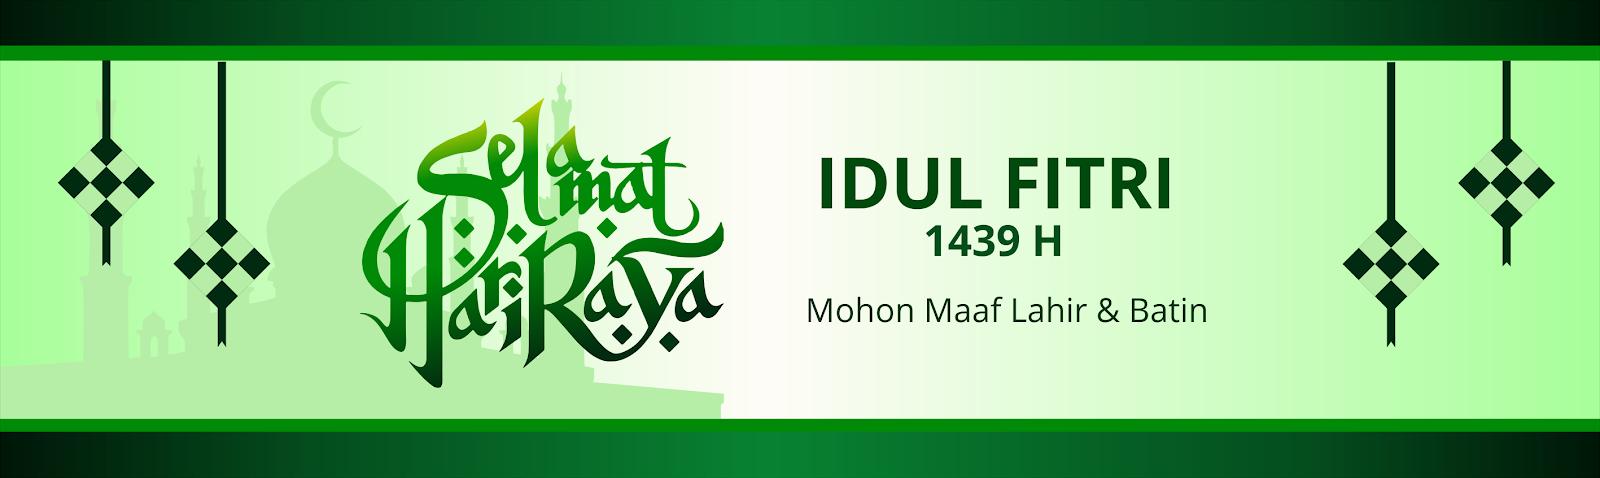 Desain Banner Spanduk Hari Raya Idul Fitri H Informasi Jawa Tengah Online